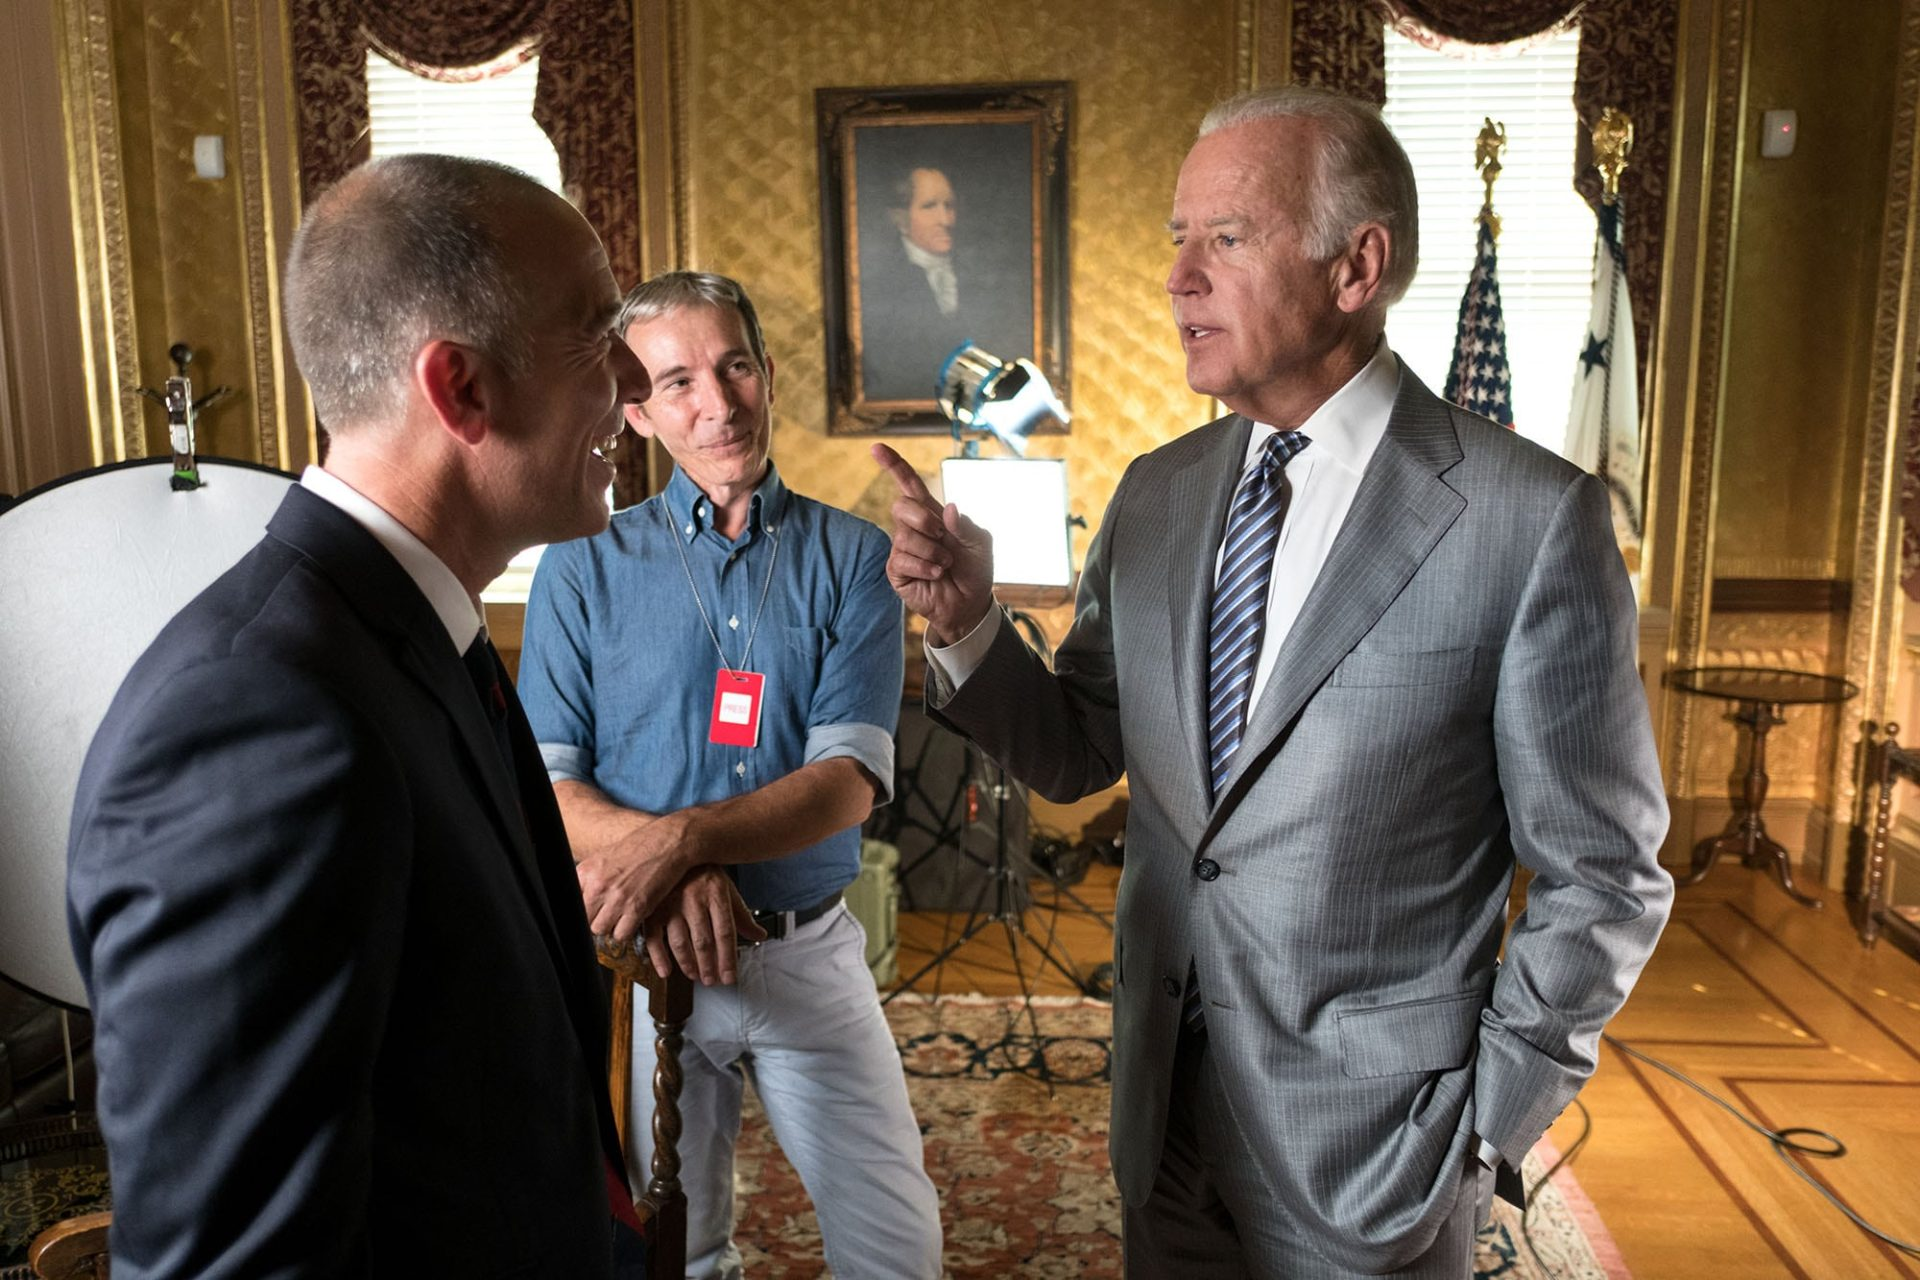 President Obama: In His Own Words Joe Biden - Vice President White House /HISTORY®